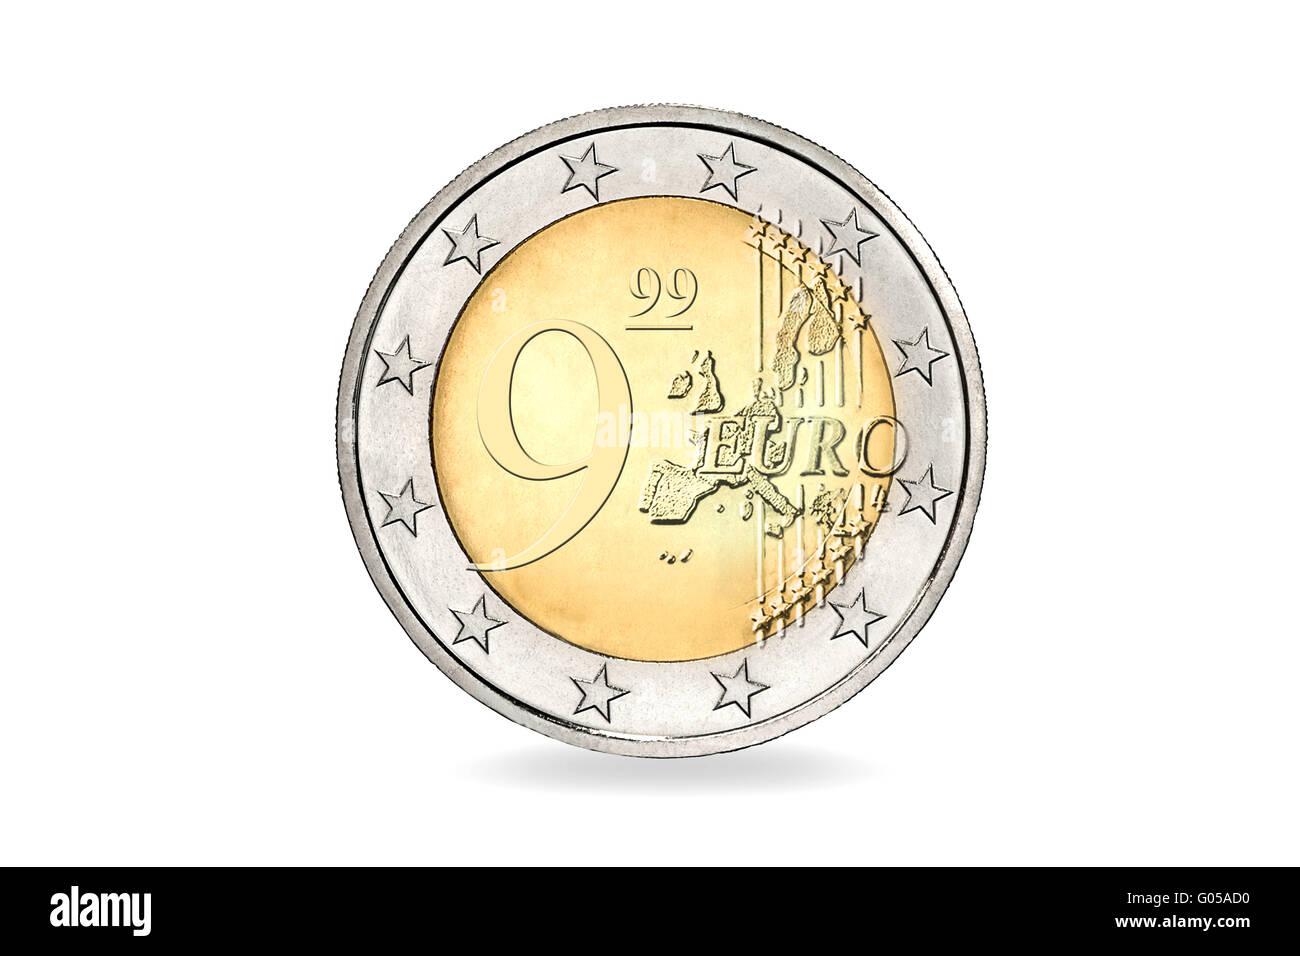 9,99 EUR - Stock Image